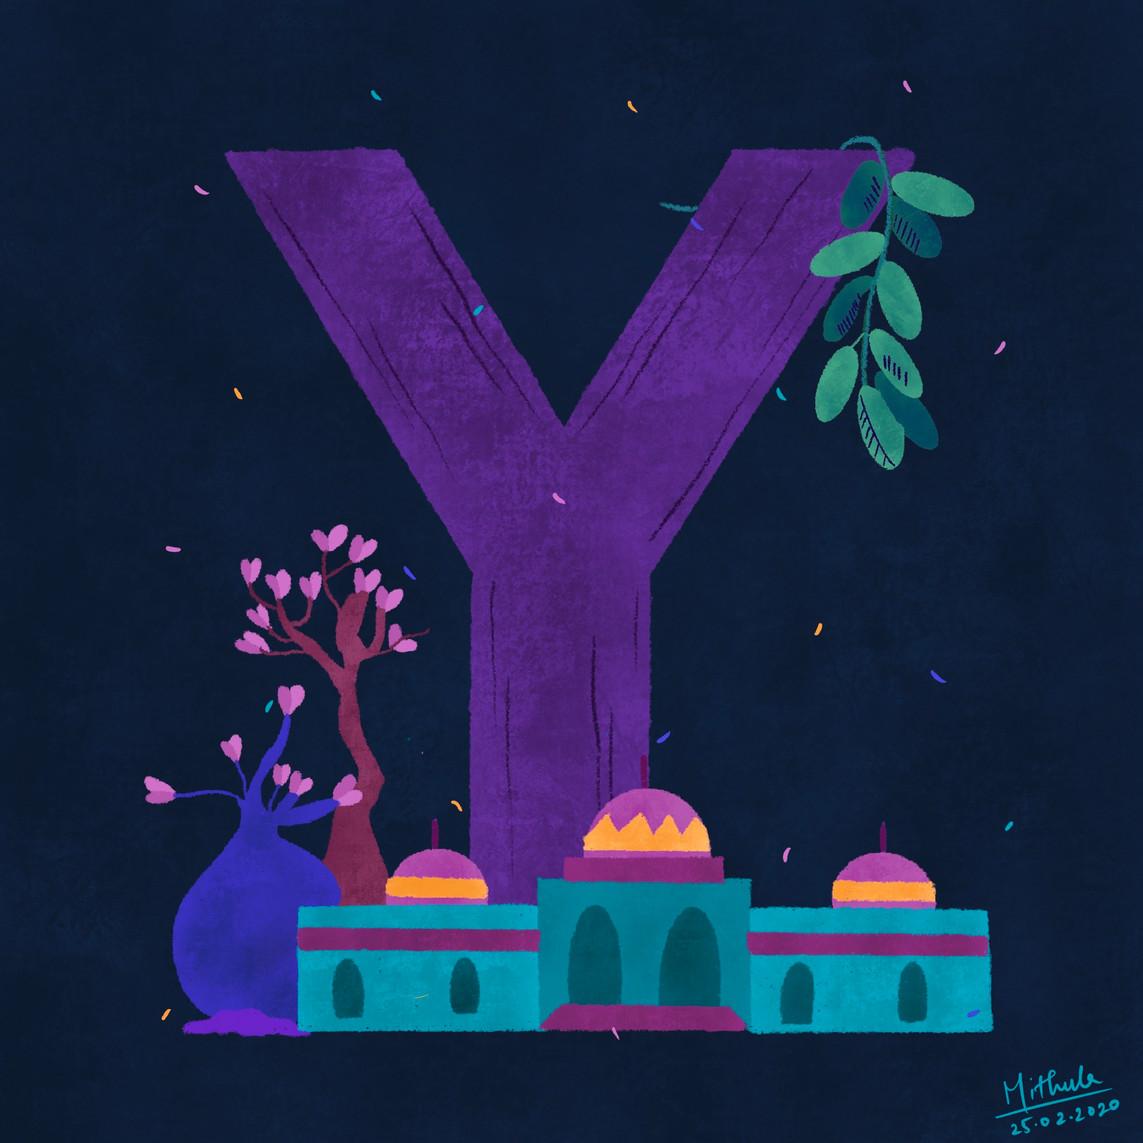 Y for Yemen